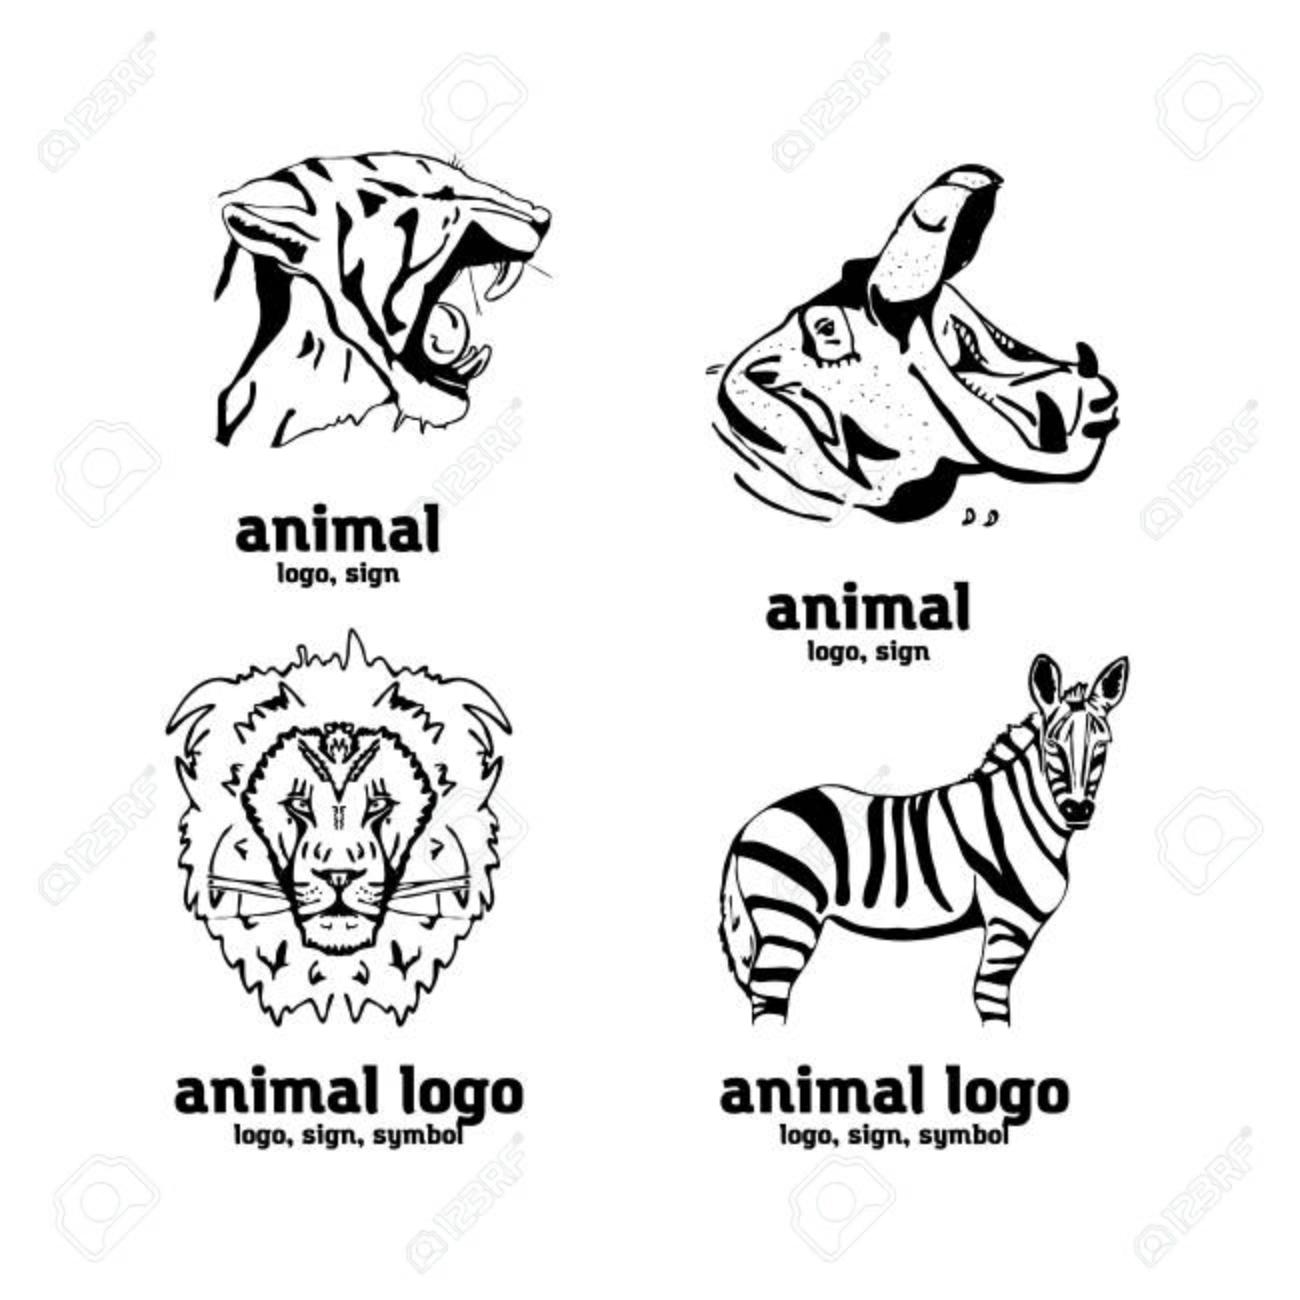 Hand drawn pencil graphics african animals logo sign symbol banque d